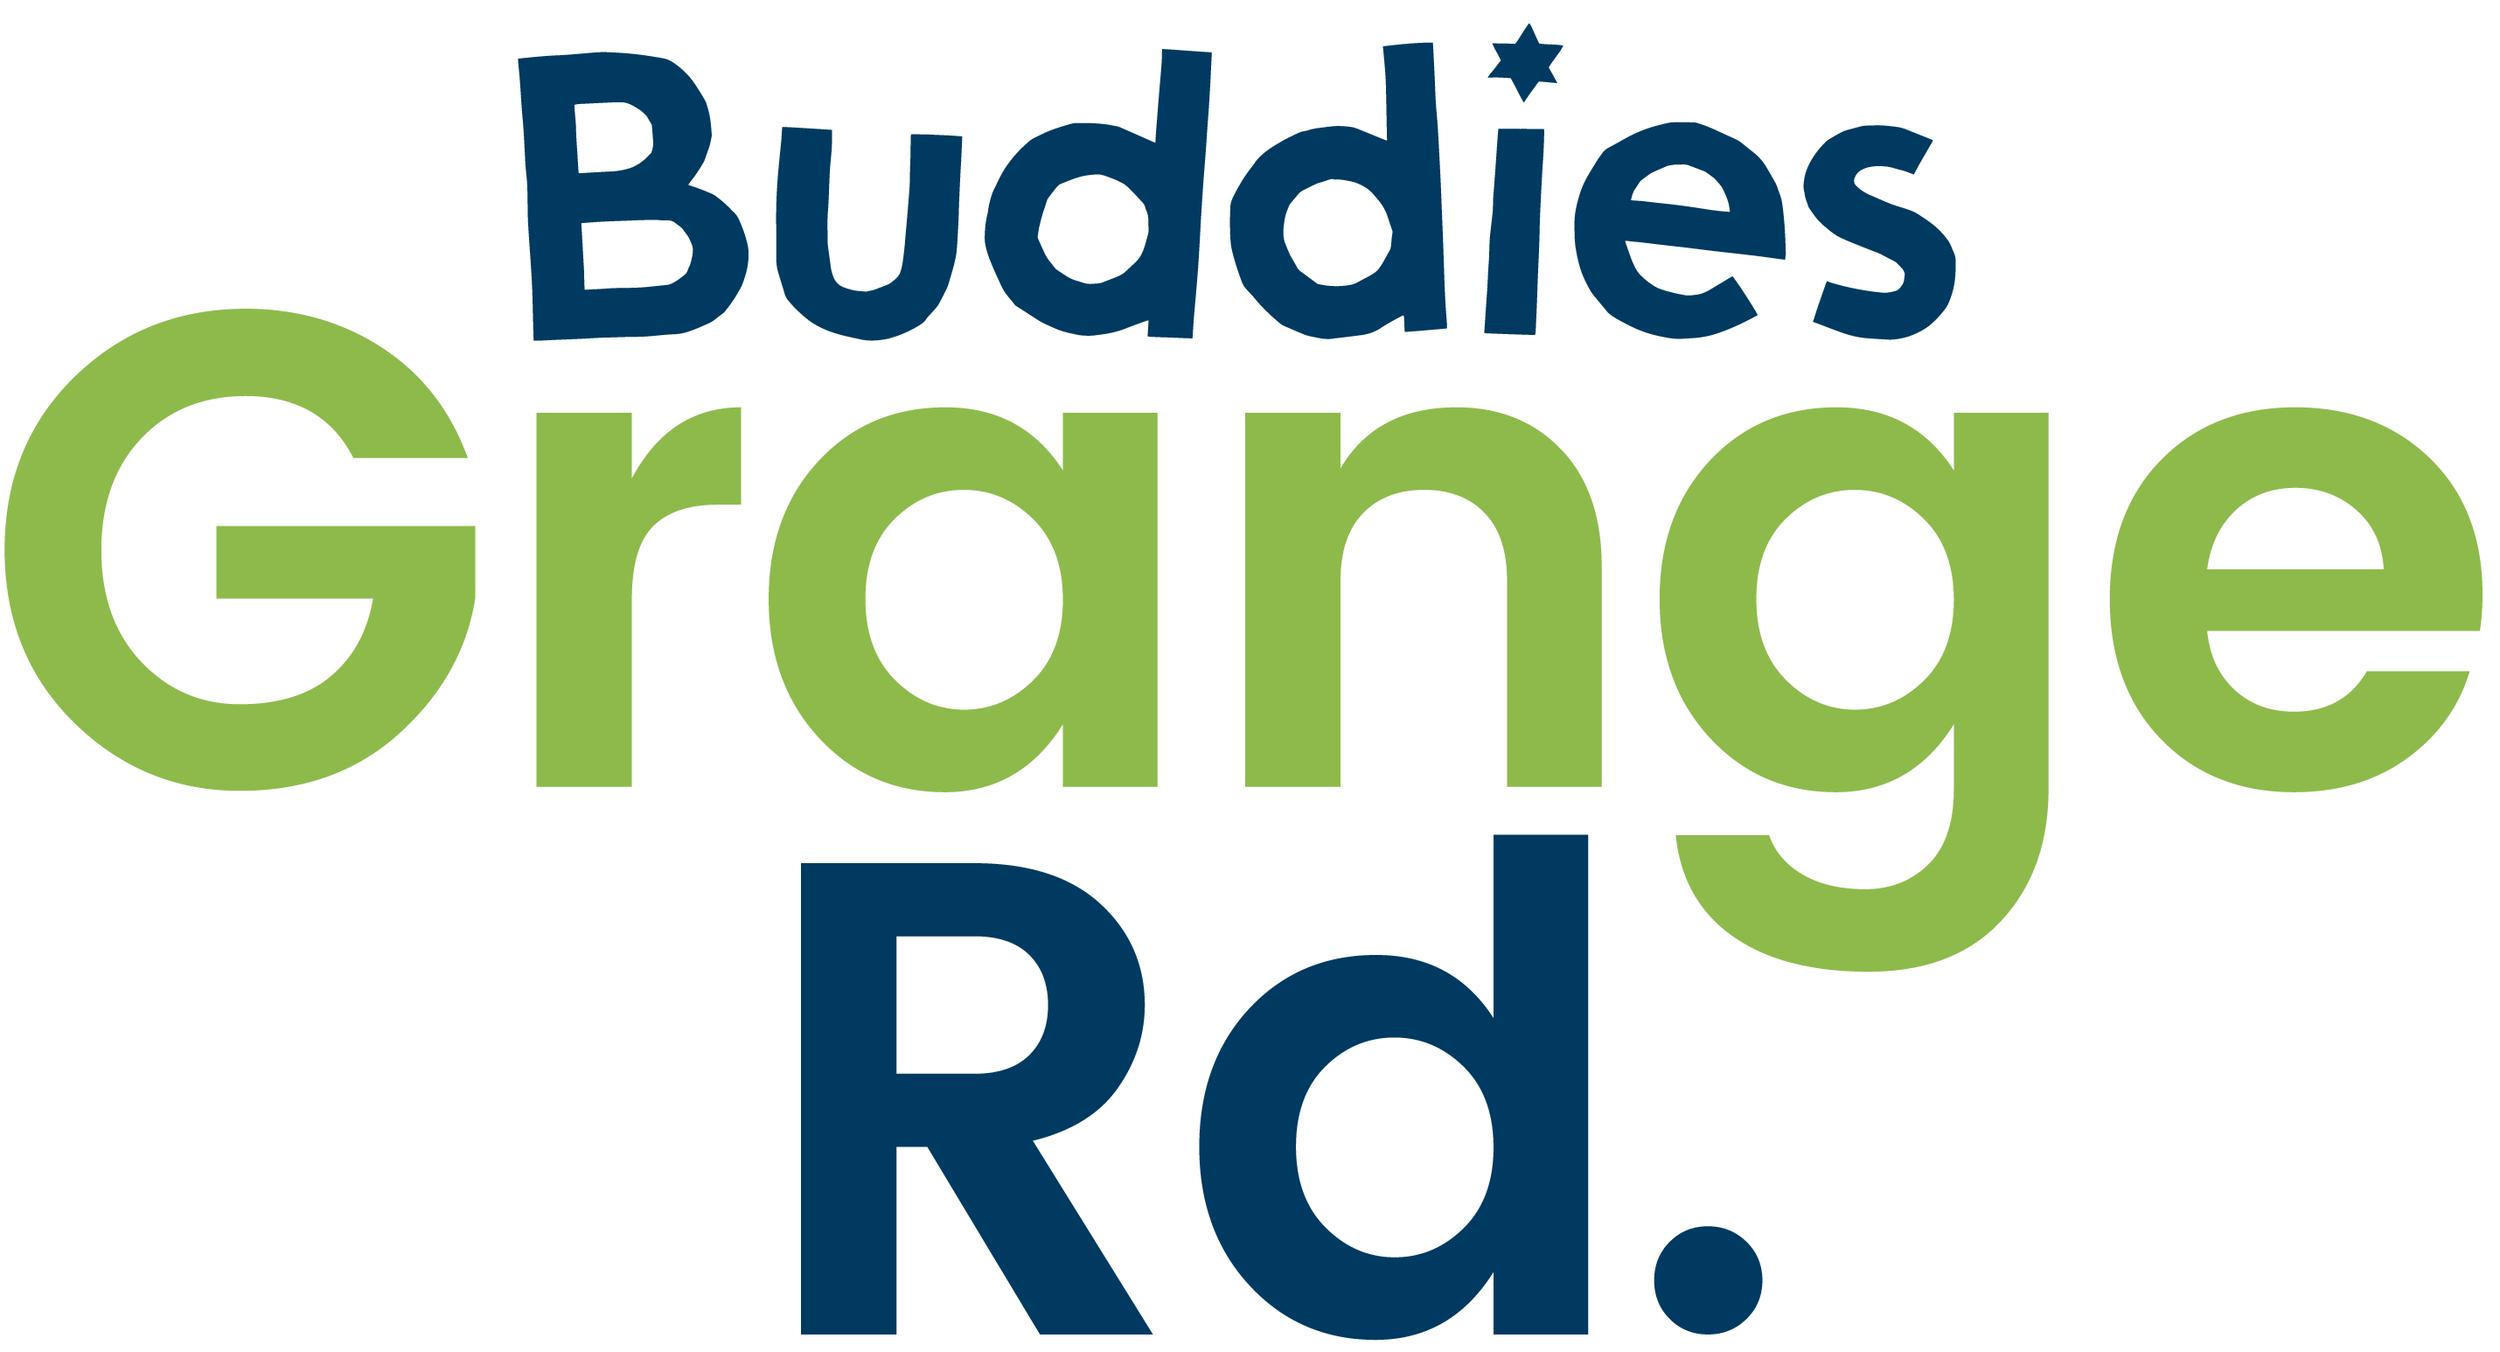 Buddies_Locations_edit-05.png